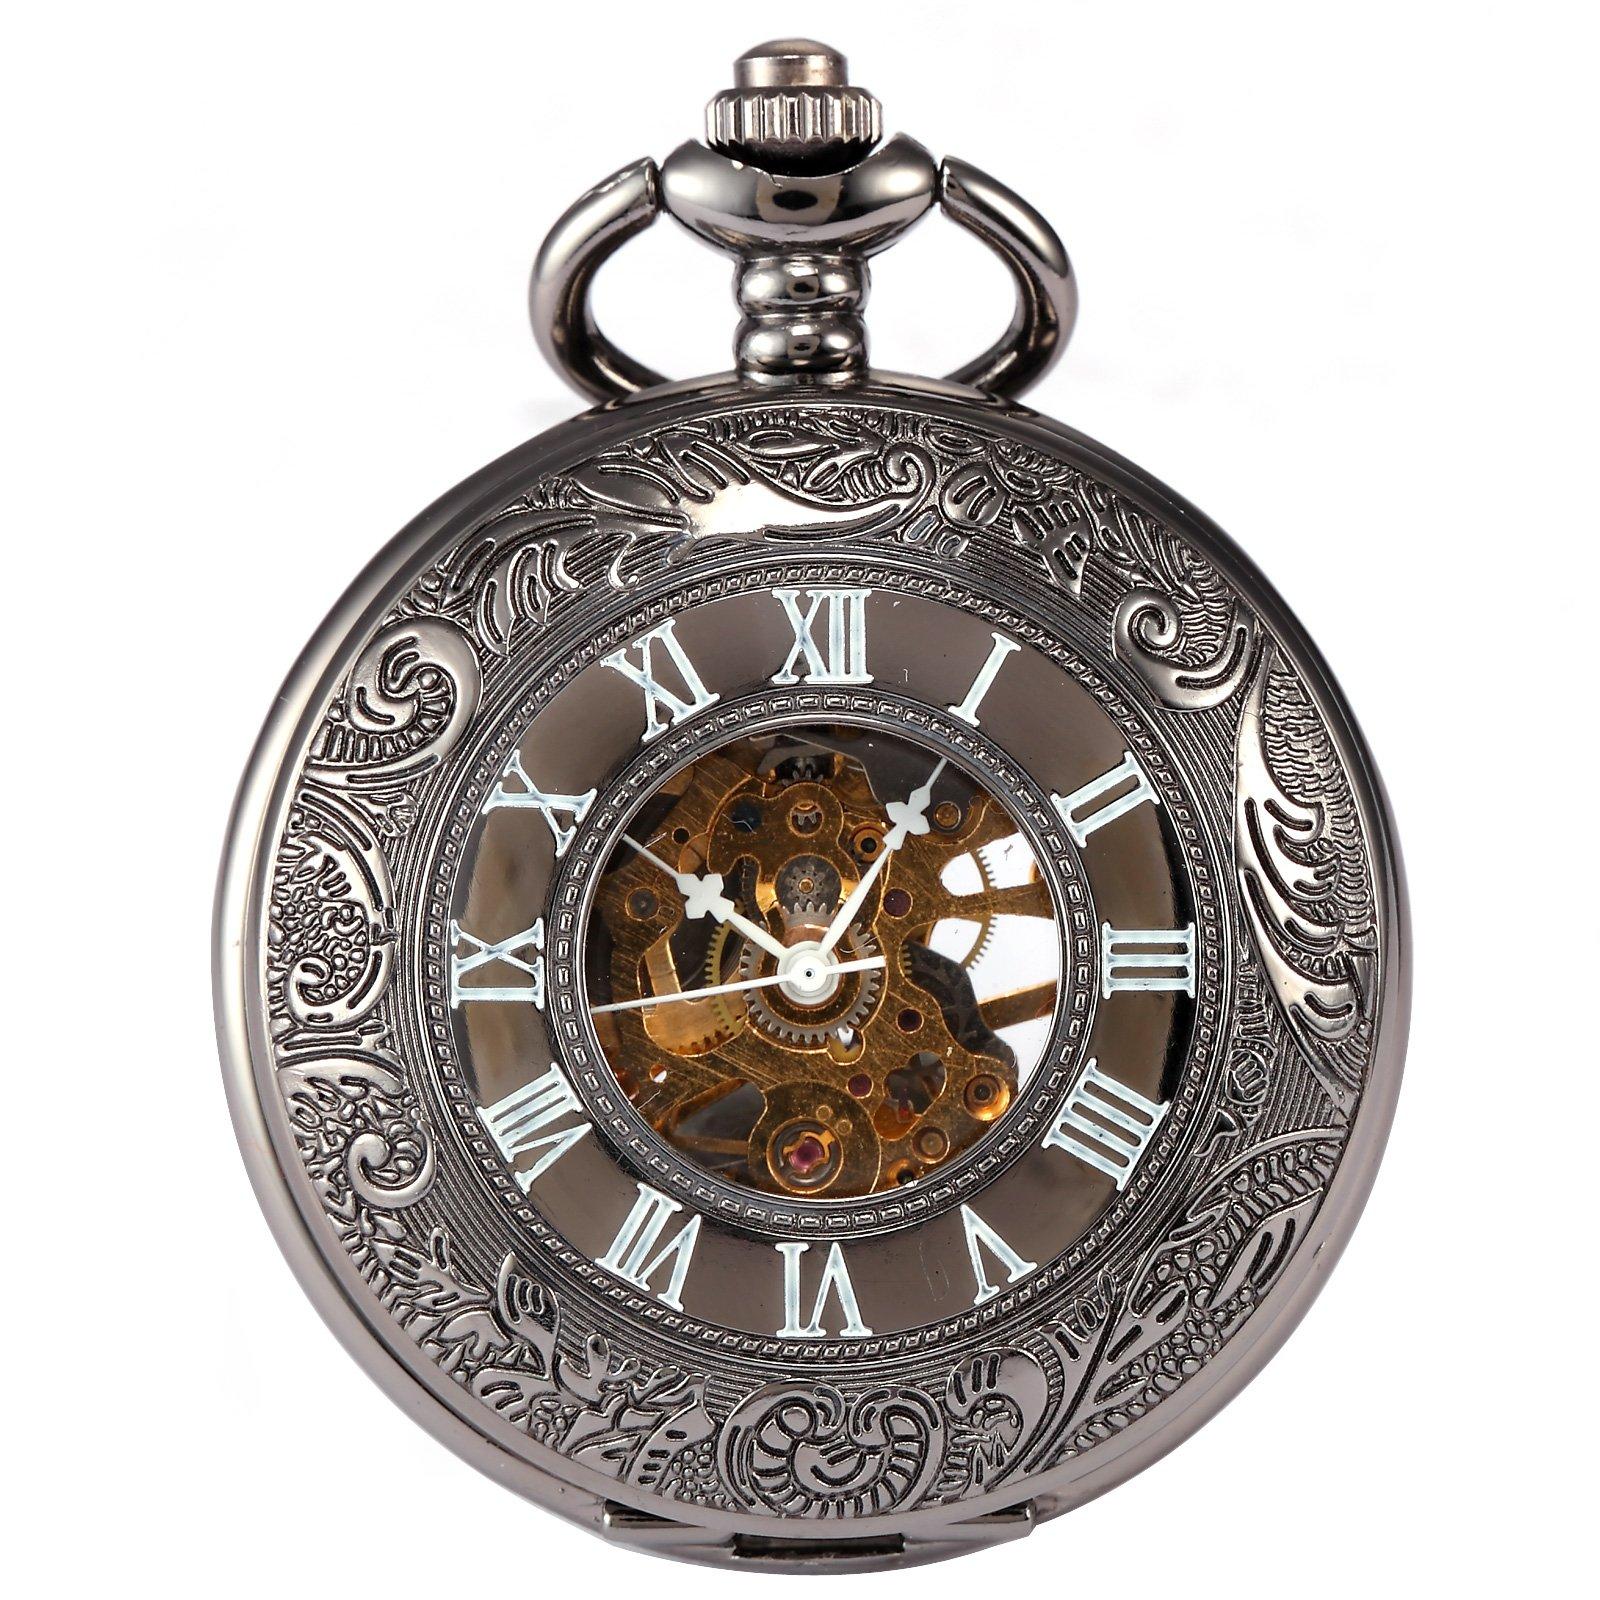 AMPM24 Vintage Hollow Skeleton Case Mechanical Hand Wind Pocket Watch WPK015